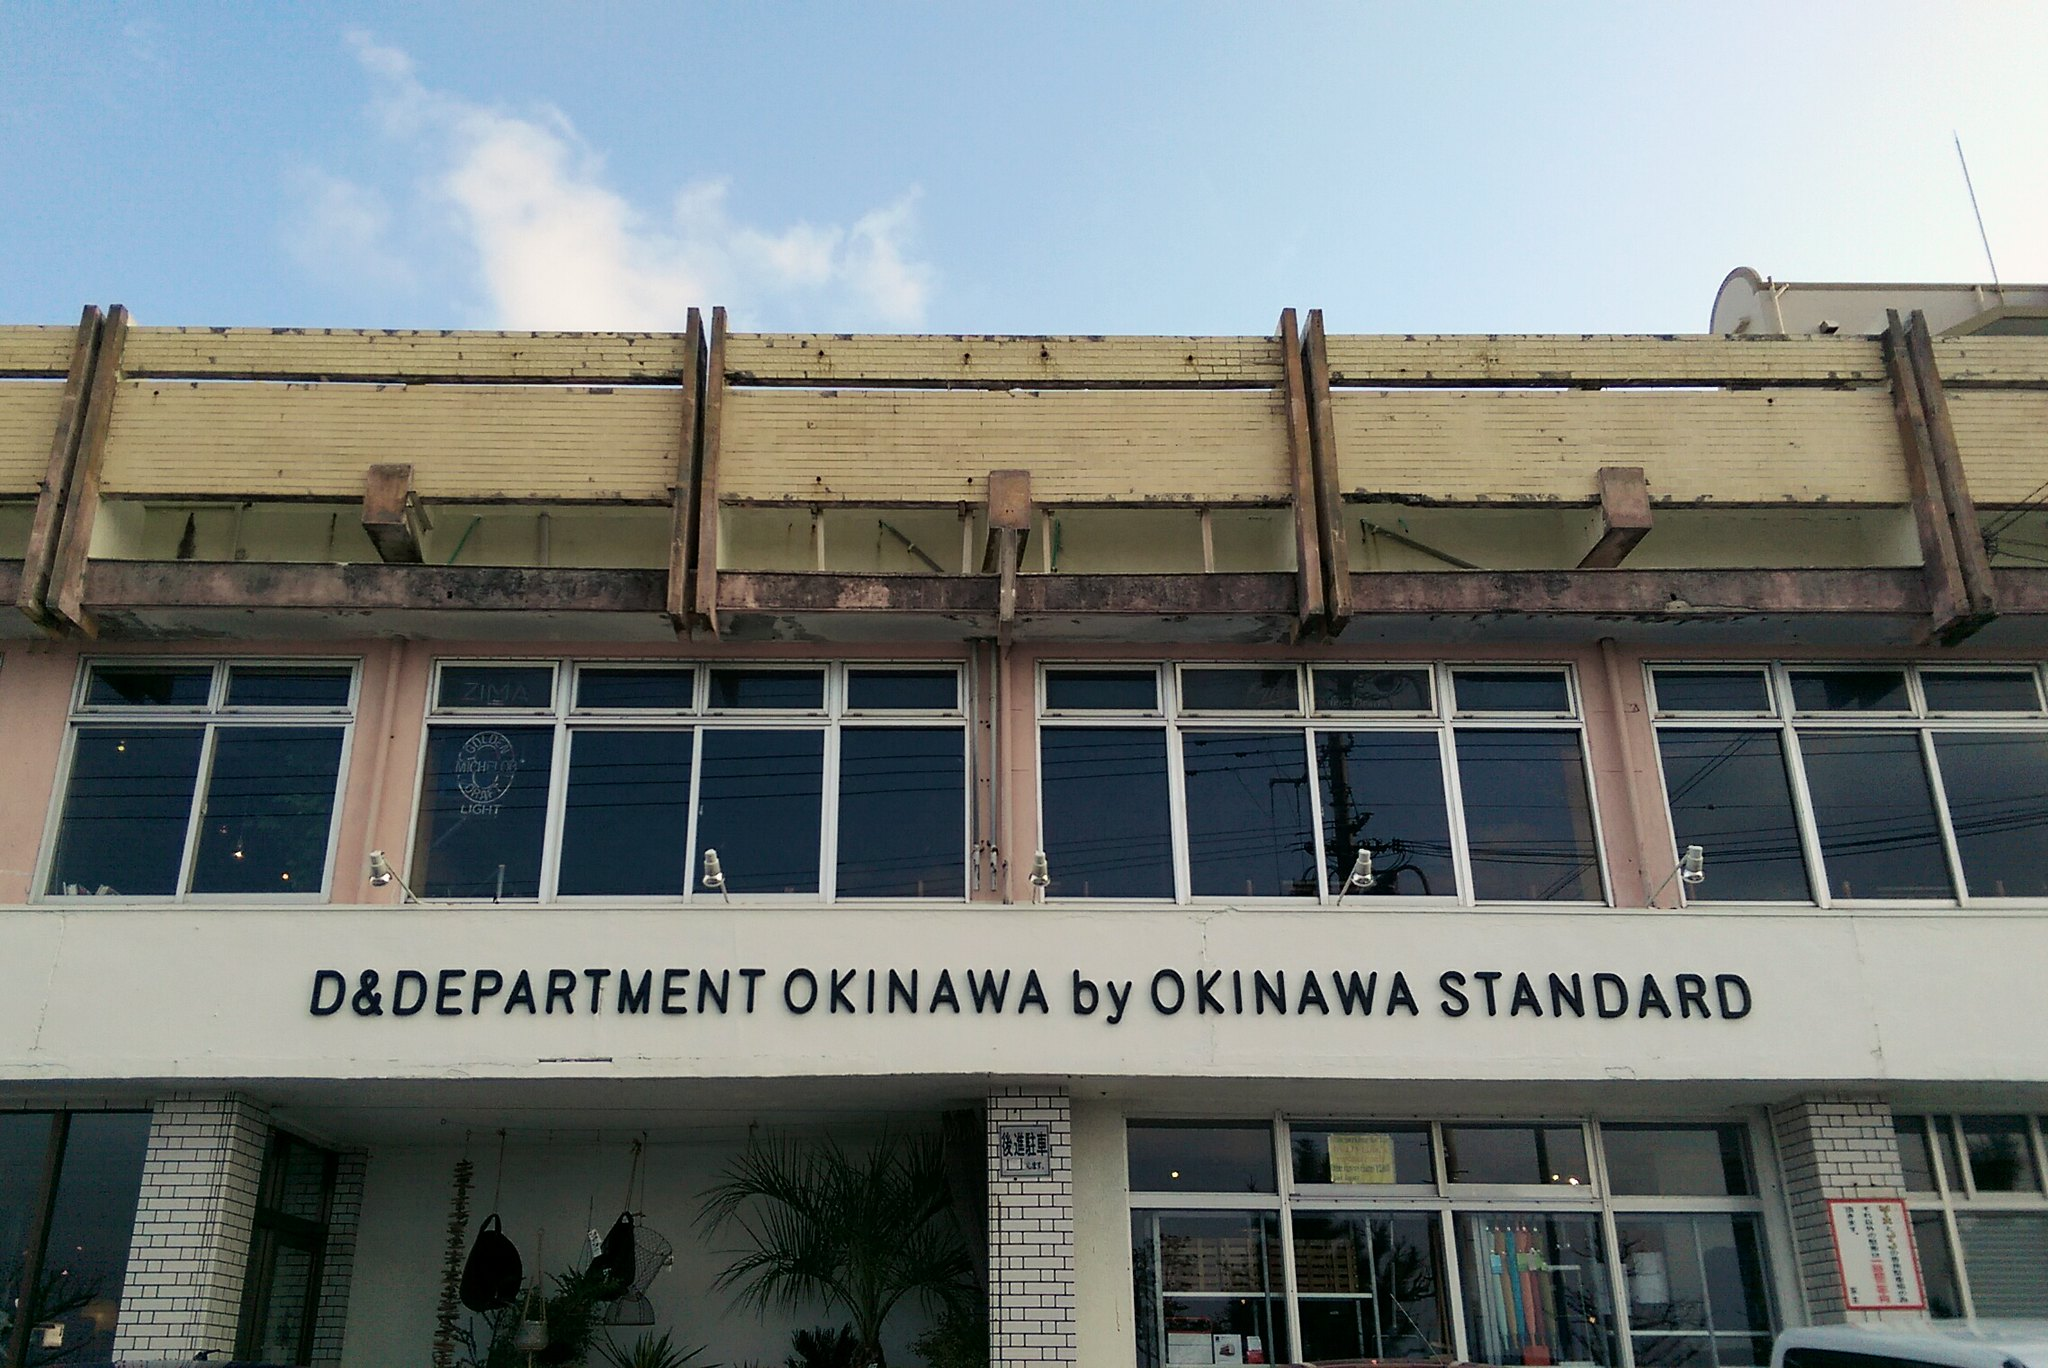 okinawa design store